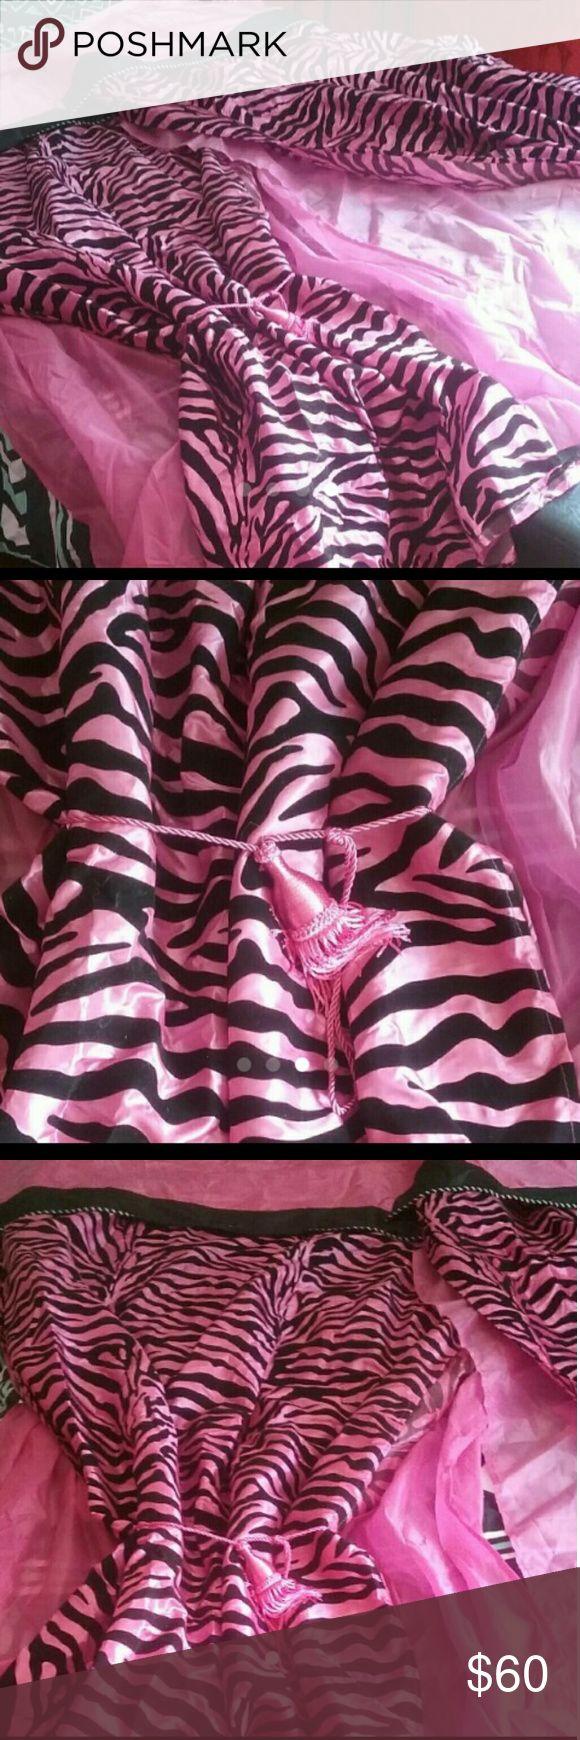 Hot pink zebra curtains - Pink Zebra Curtains